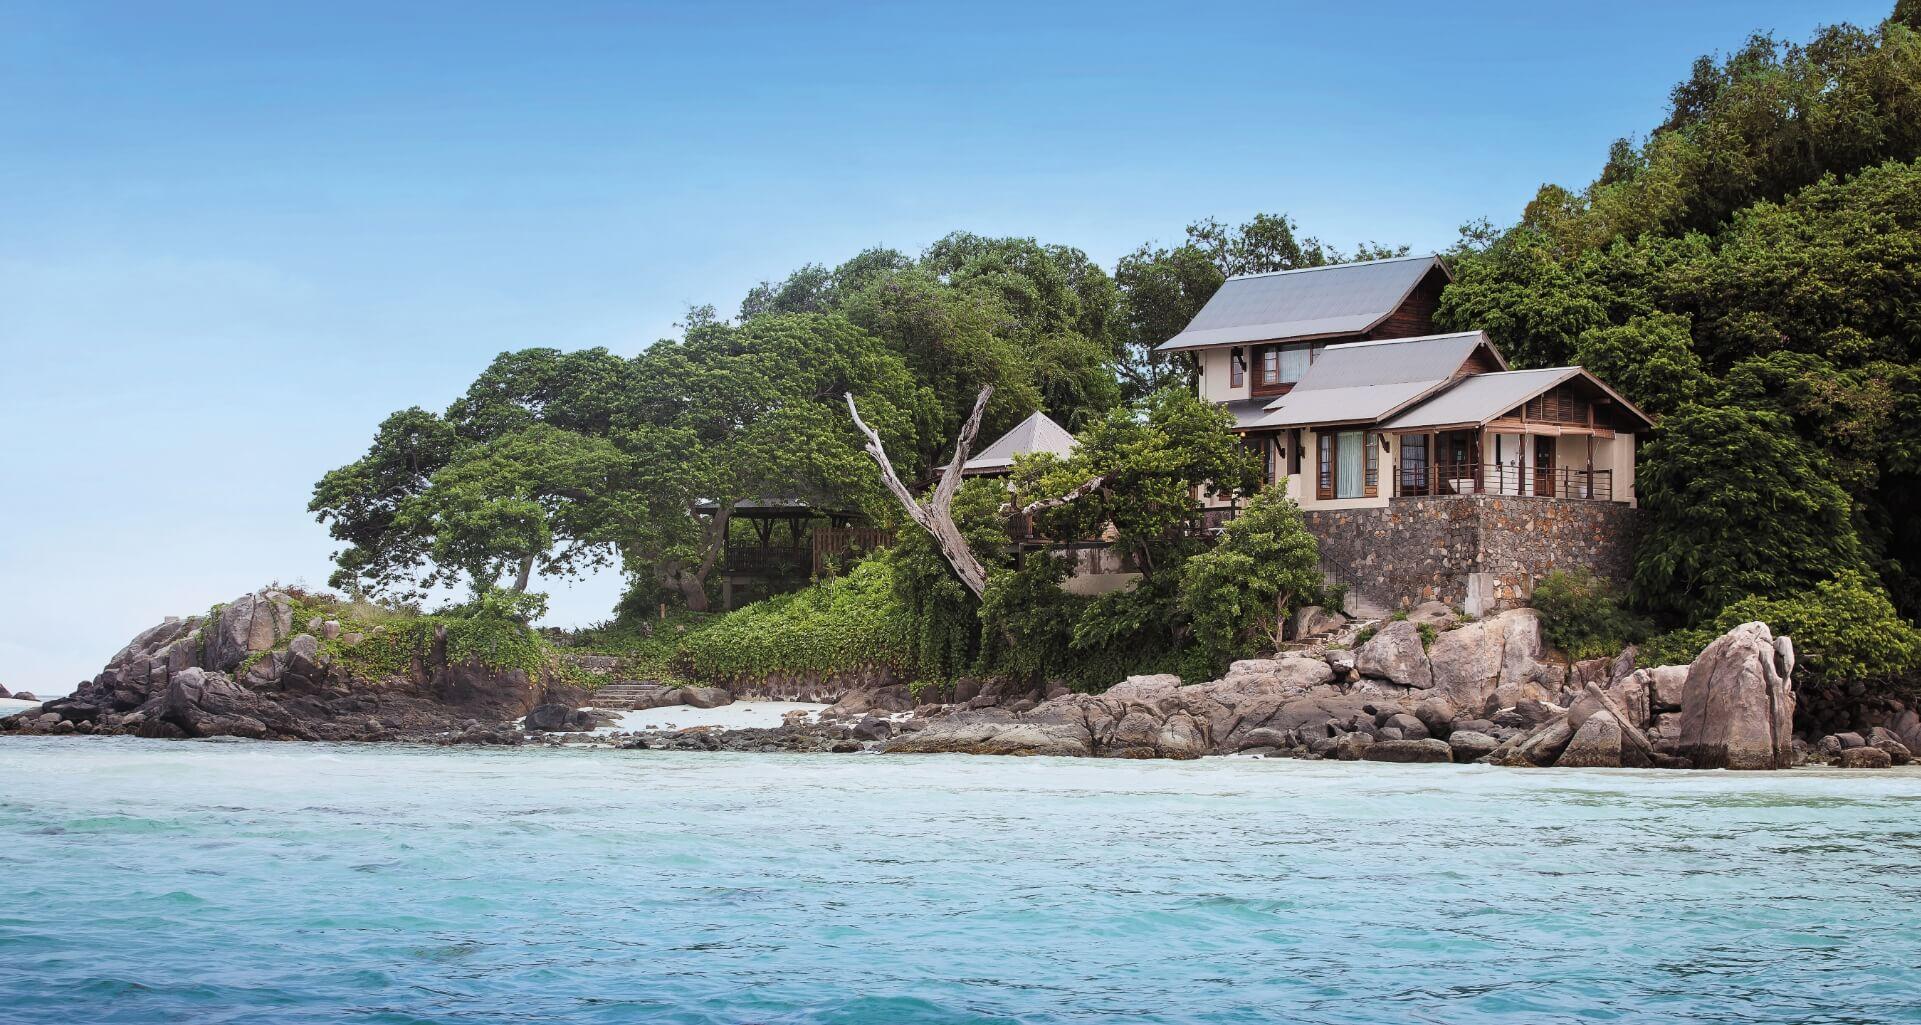 Enchanted Island Resort View of the Owner's Signature Villa.jpg